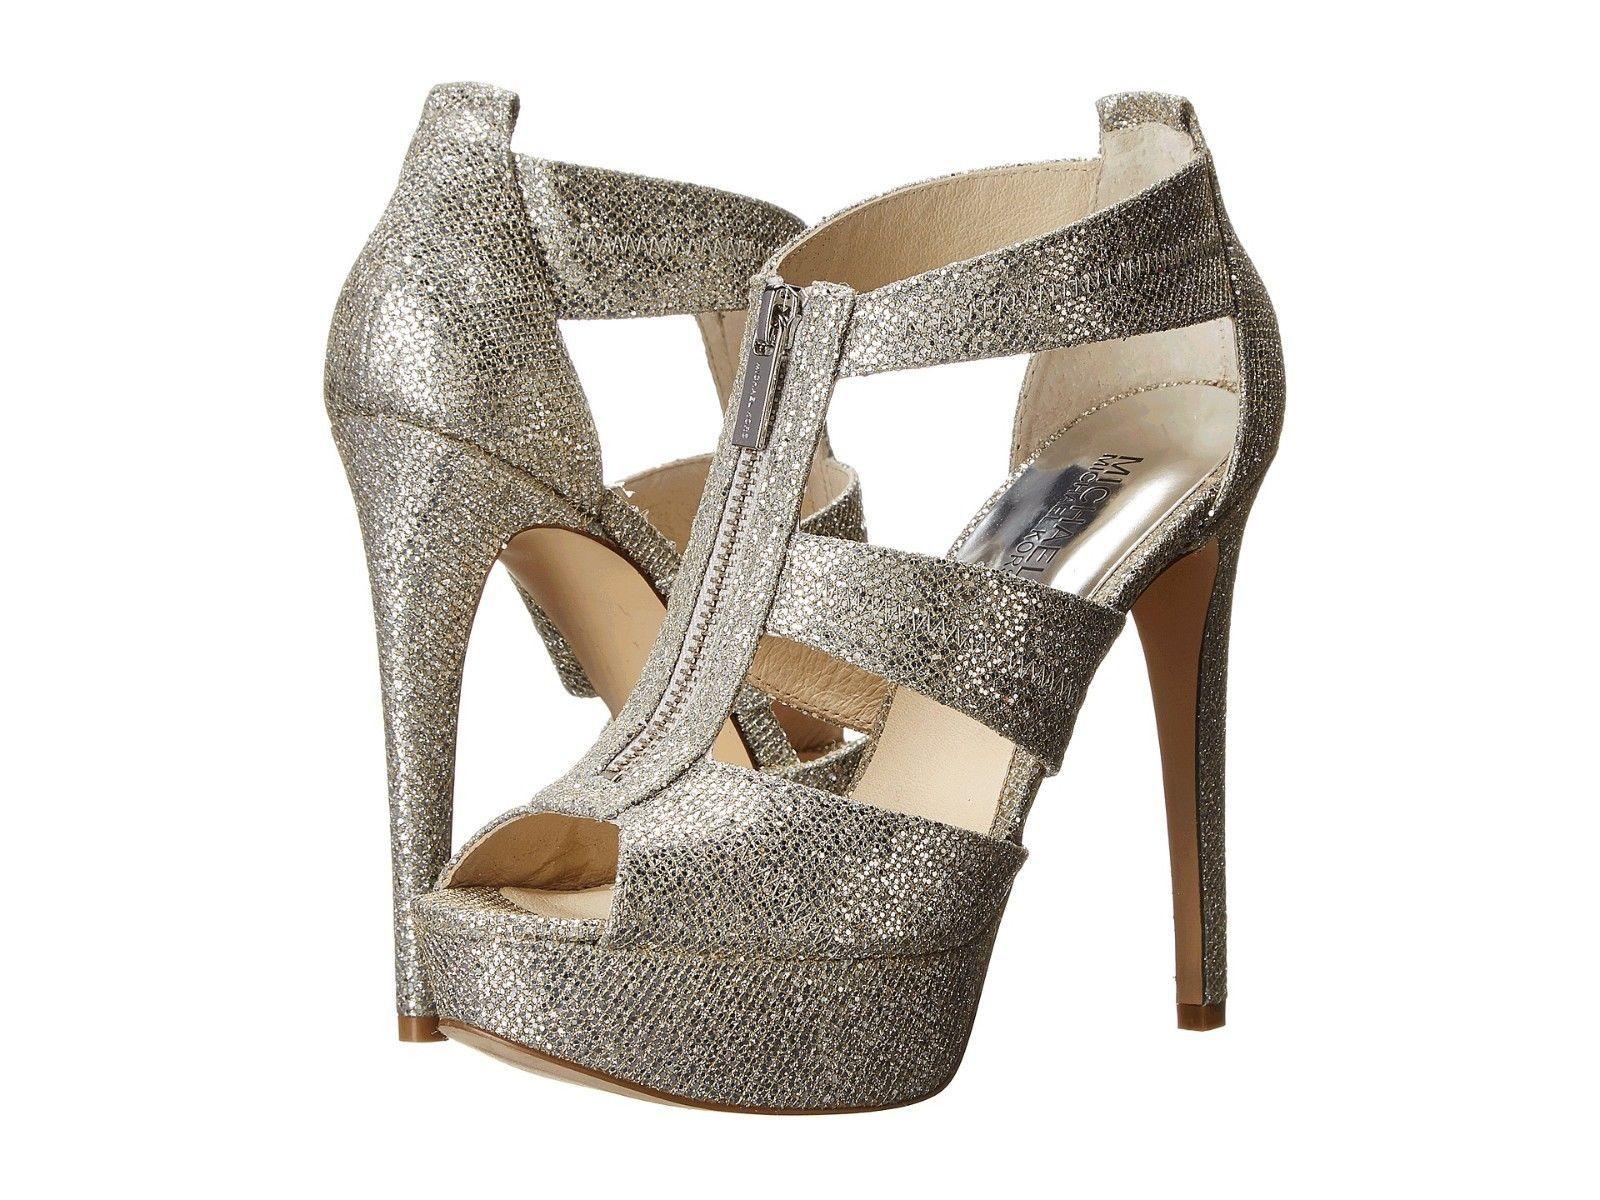 ee9e7237c771 S l1600. S l1600. Previous. MICHAEL Michael Kors Berkley Platform Silver  Glitter Women Size 8.5 ...